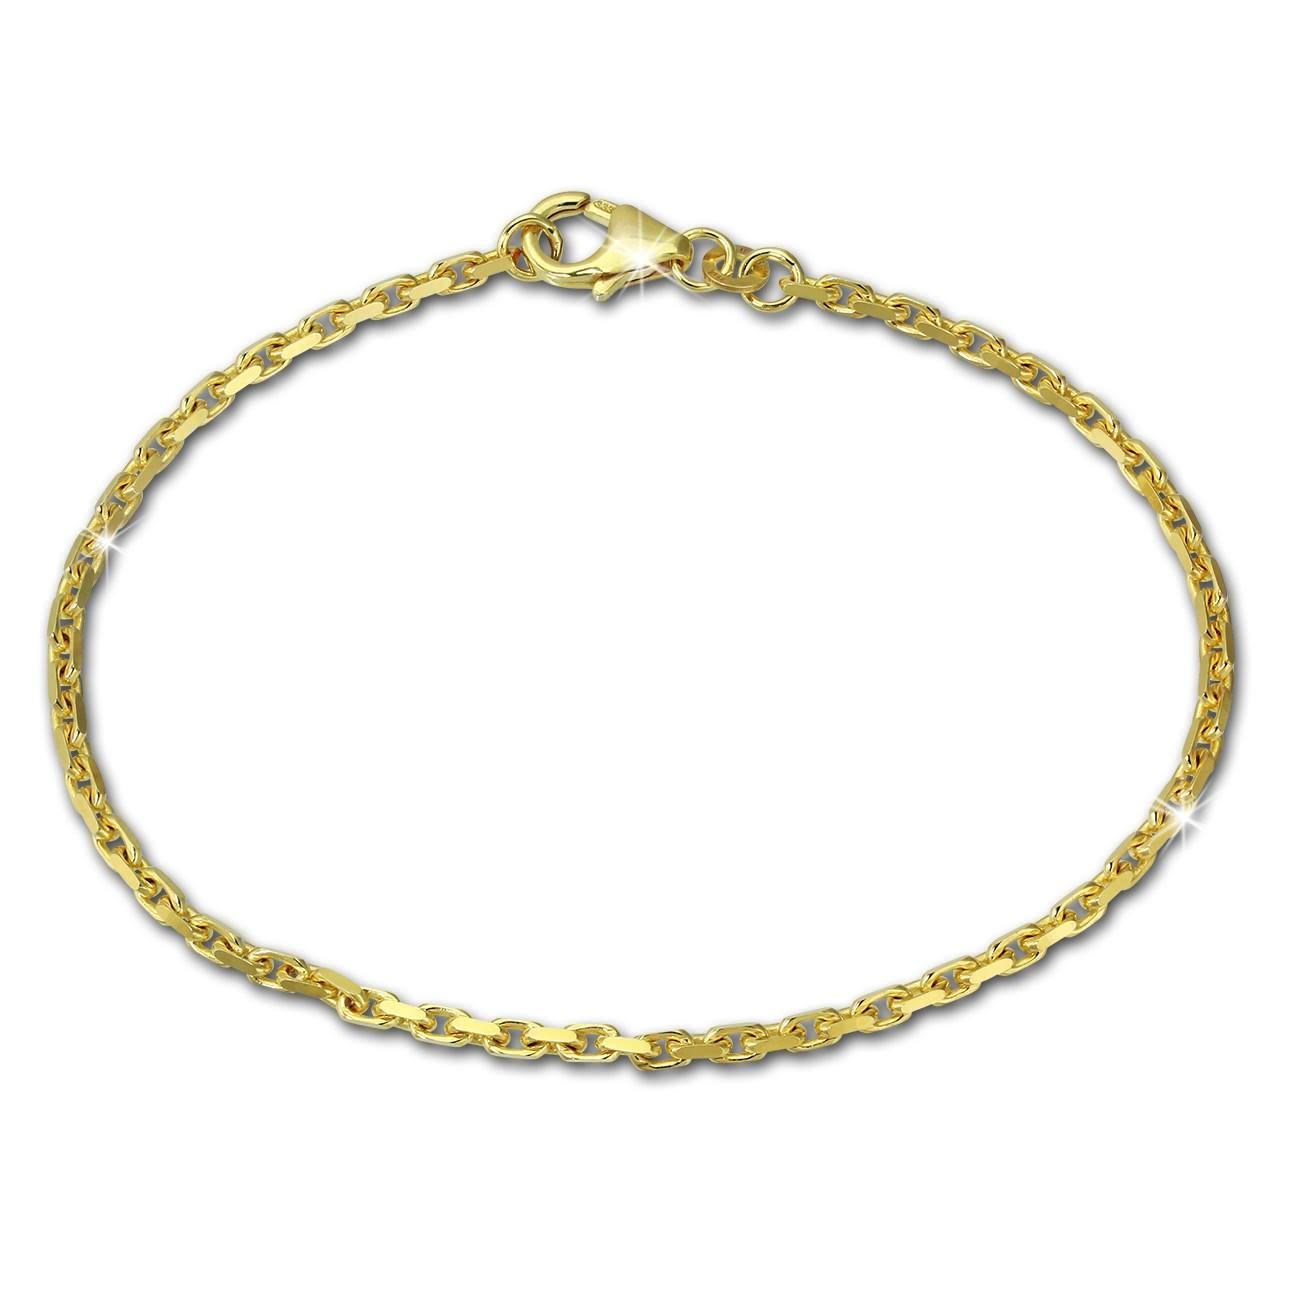 SilberDream Armband Anker diamantiert 333 Gold 18,5cm 8 Karat GDA0218Y